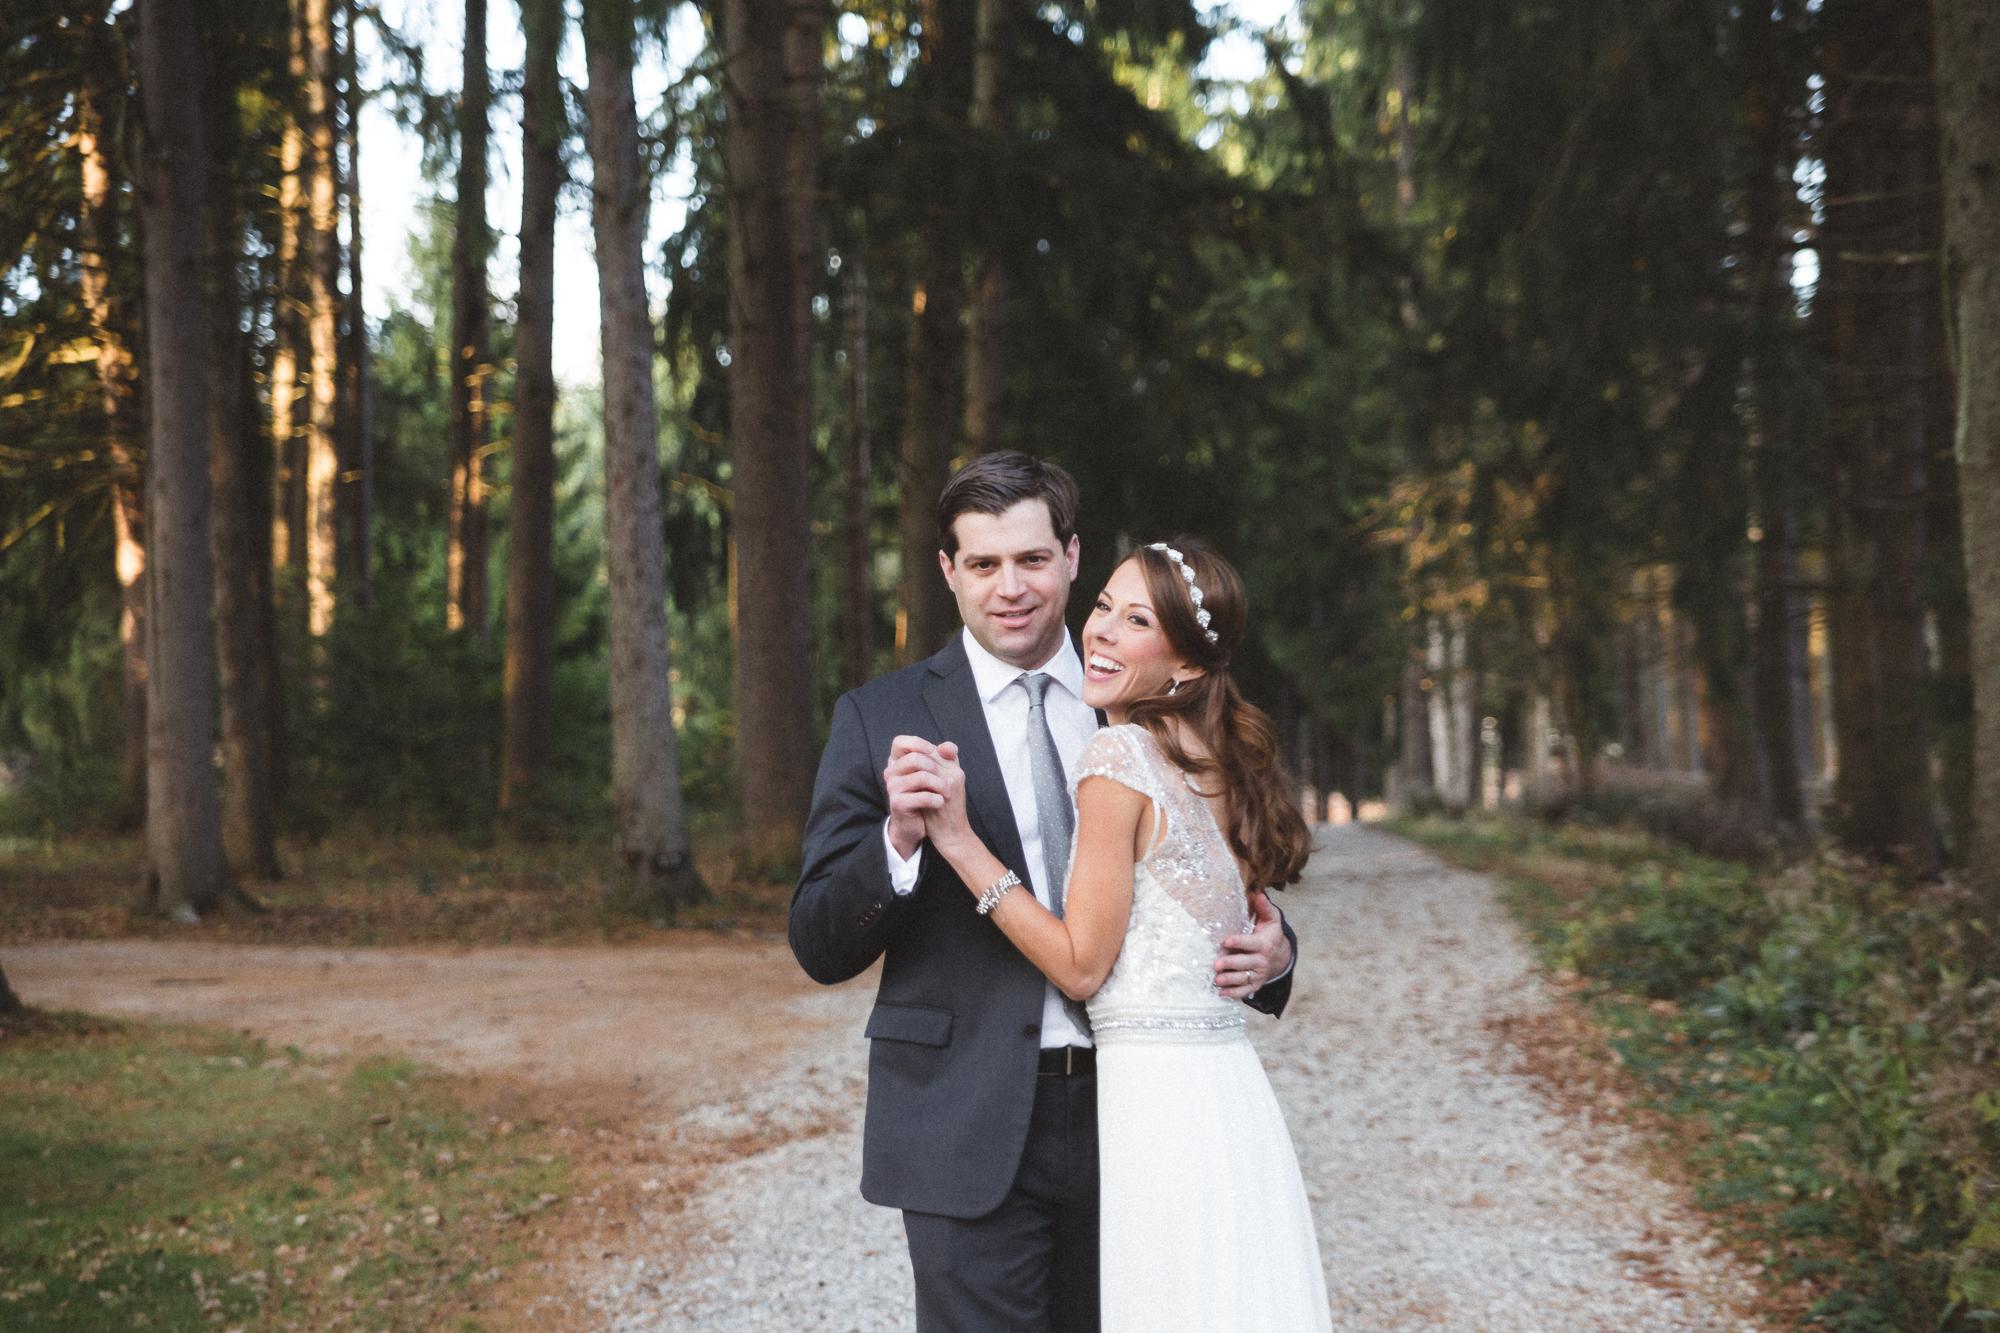 Granville Inn Wedding Photos - Columbus Ohio Wedding - Steve + Jen - DiBlasio Photo-237.jpg